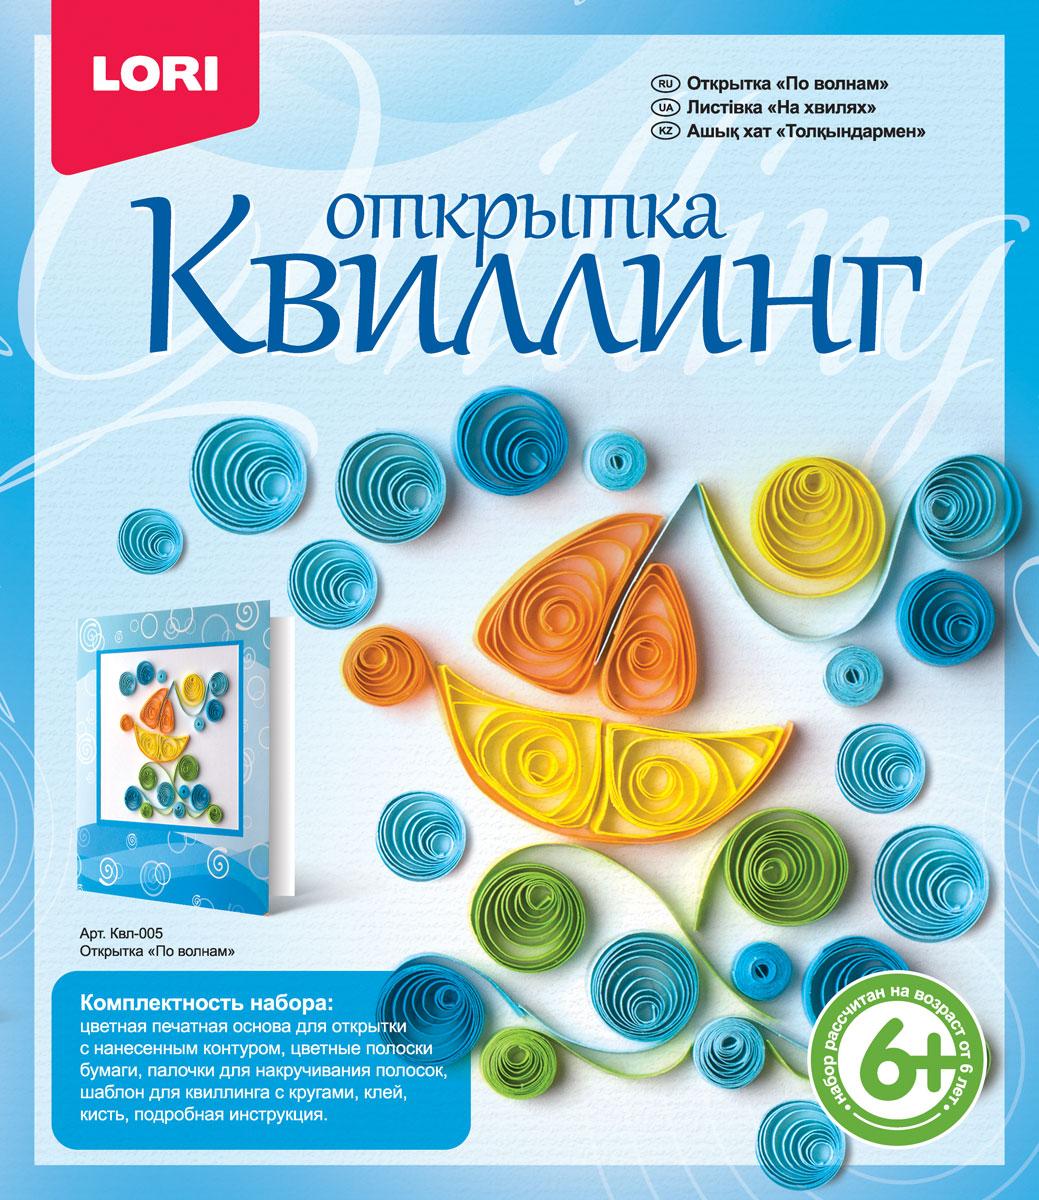 Zakazat.ru Lori Набор для квиллинга Открытка По волнам